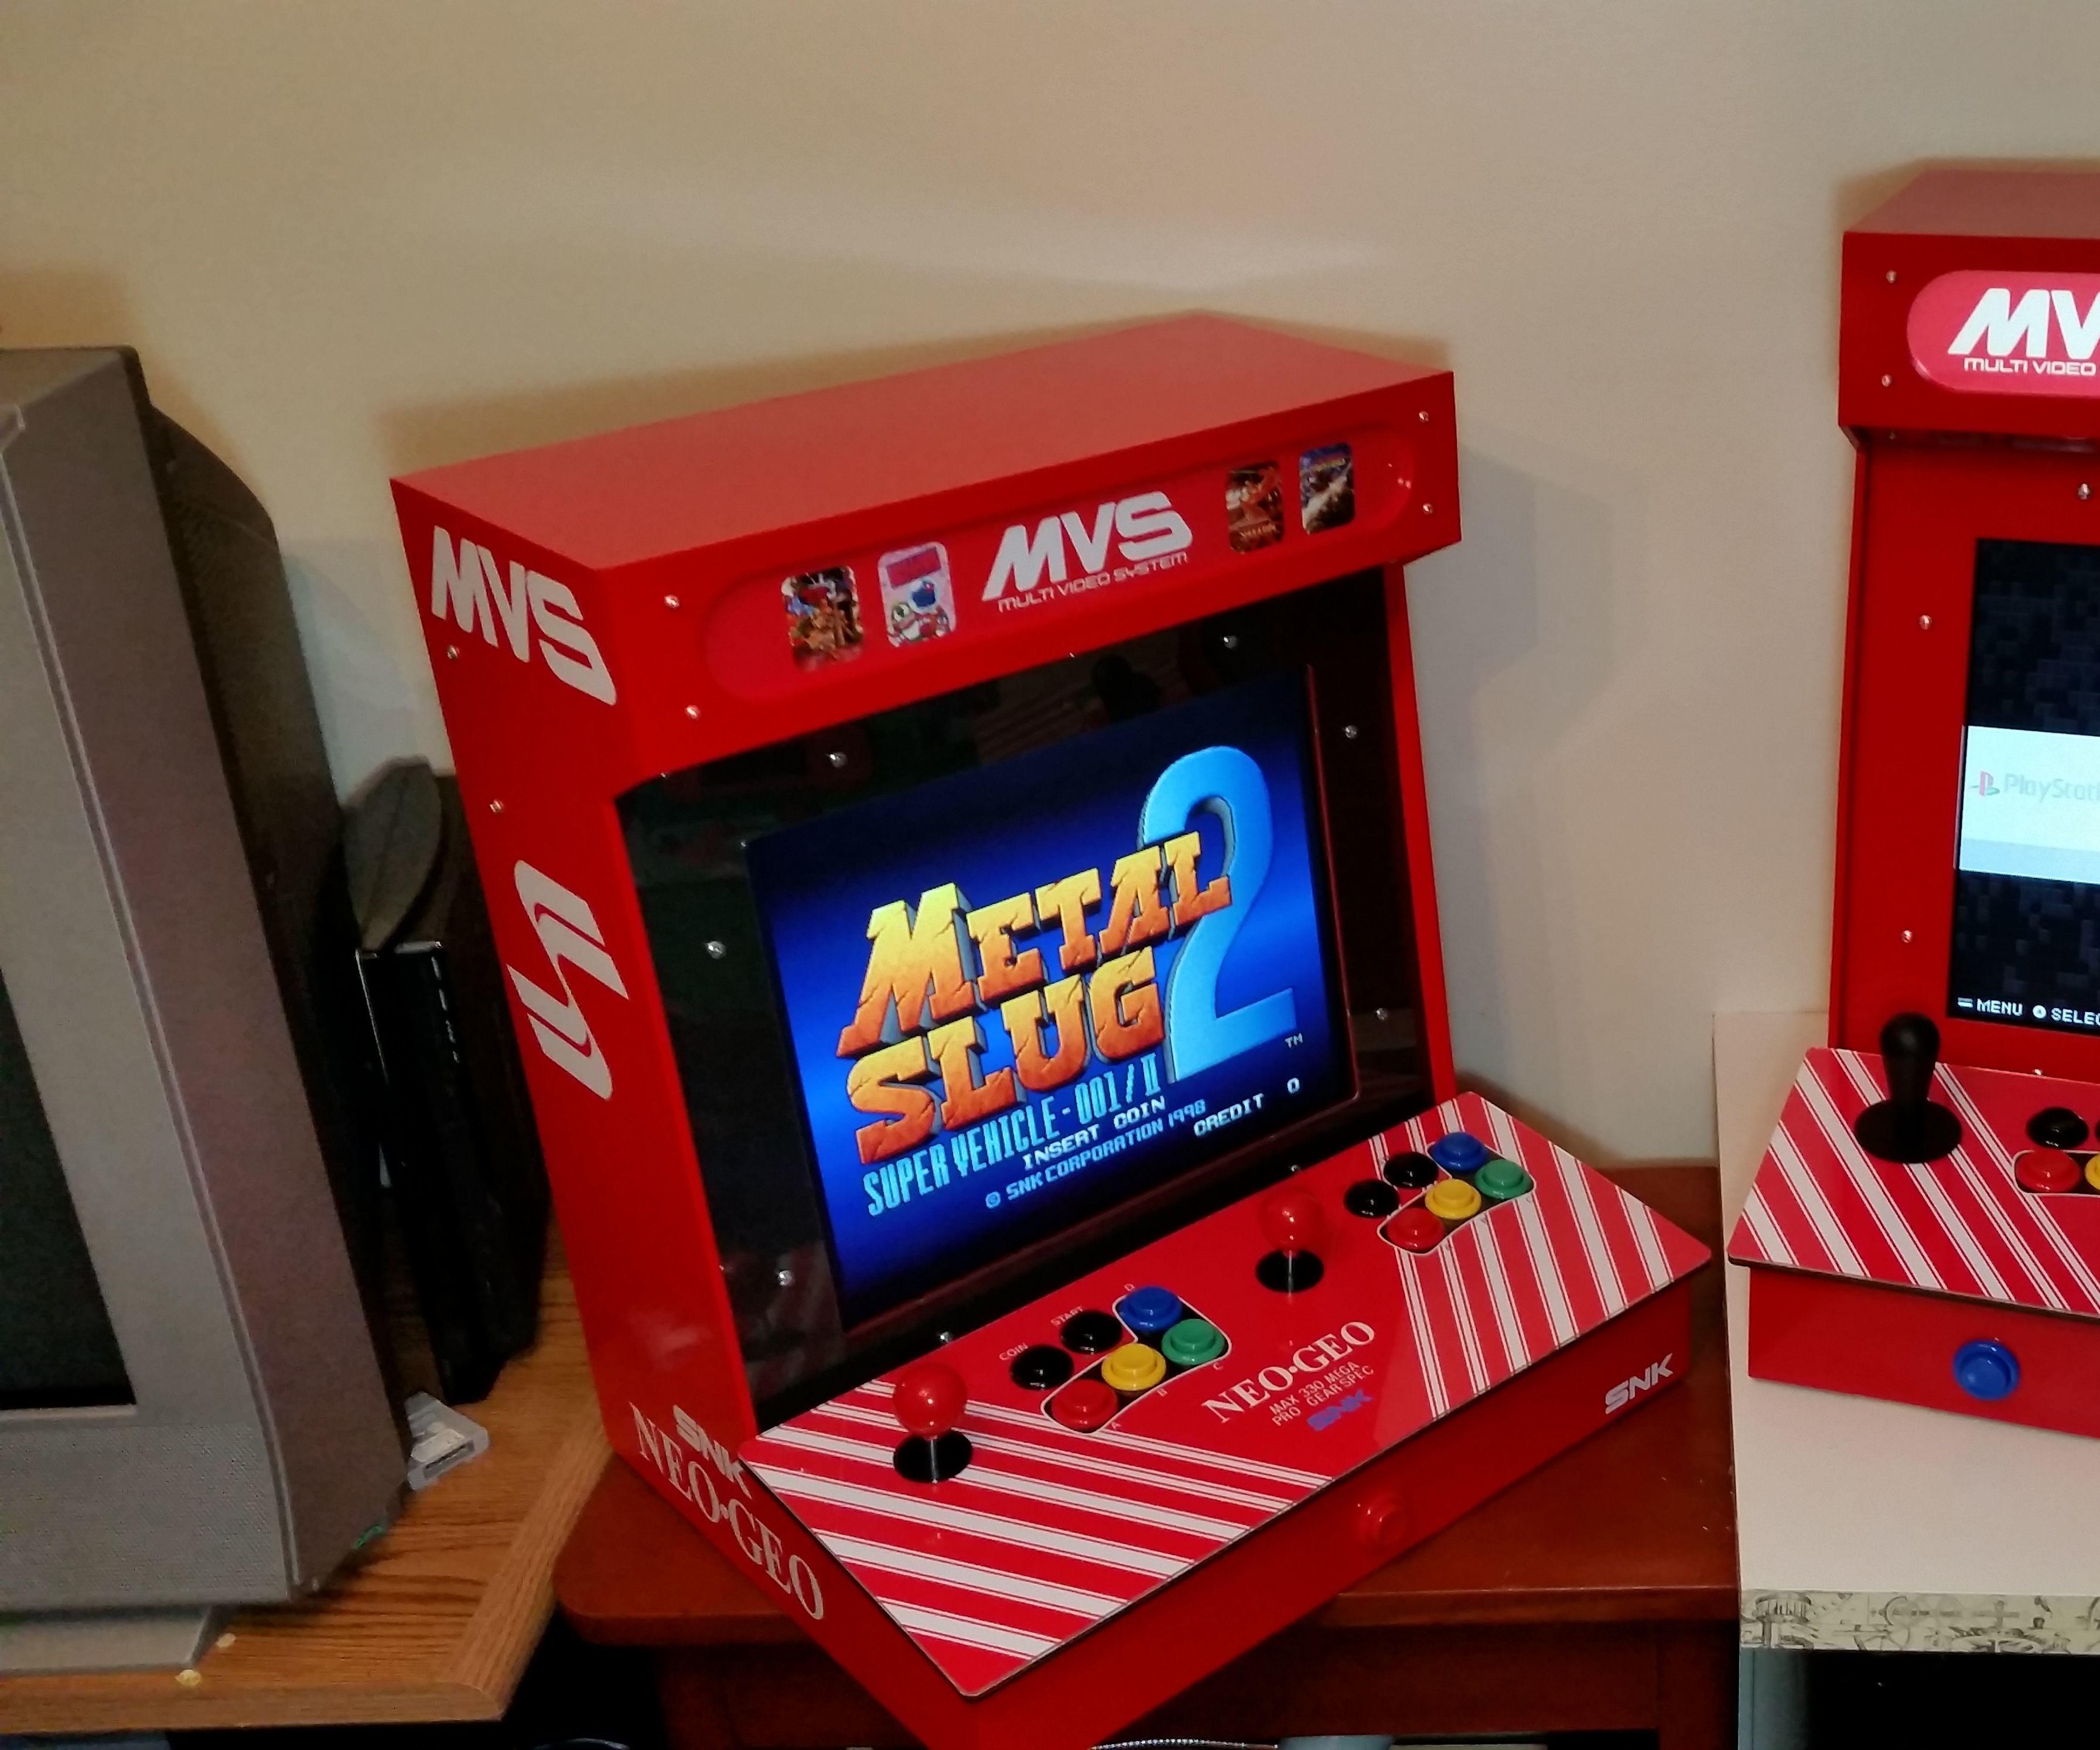 Desktop Raspberry Pi Arcade With a Discarded 17